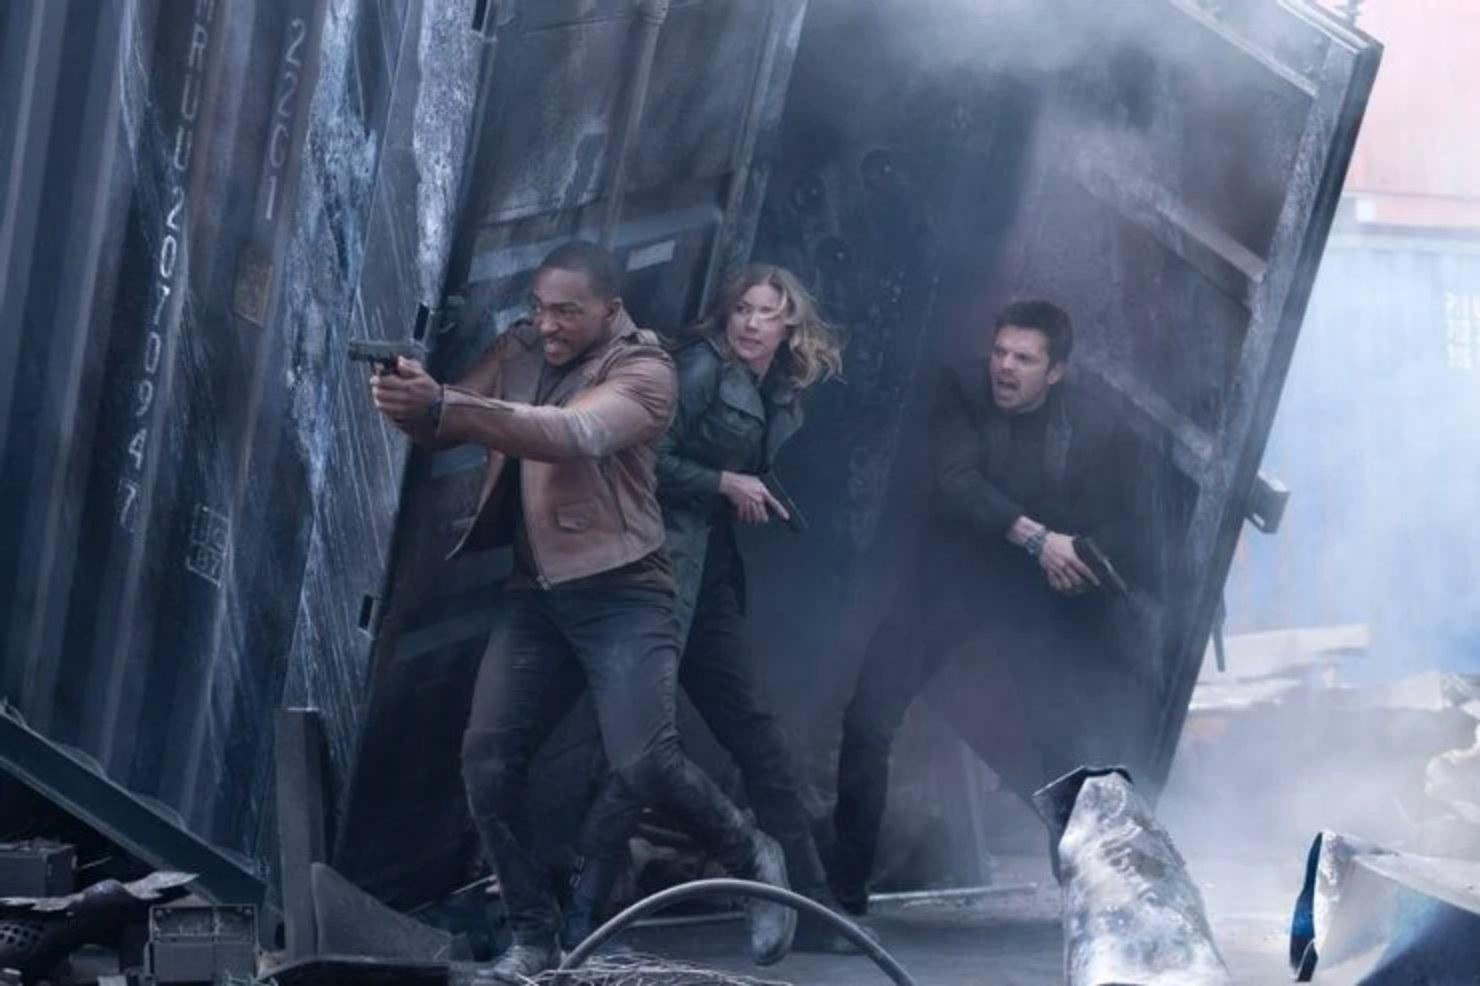 Sam, Sharon, and Bucky in a shootout scene.